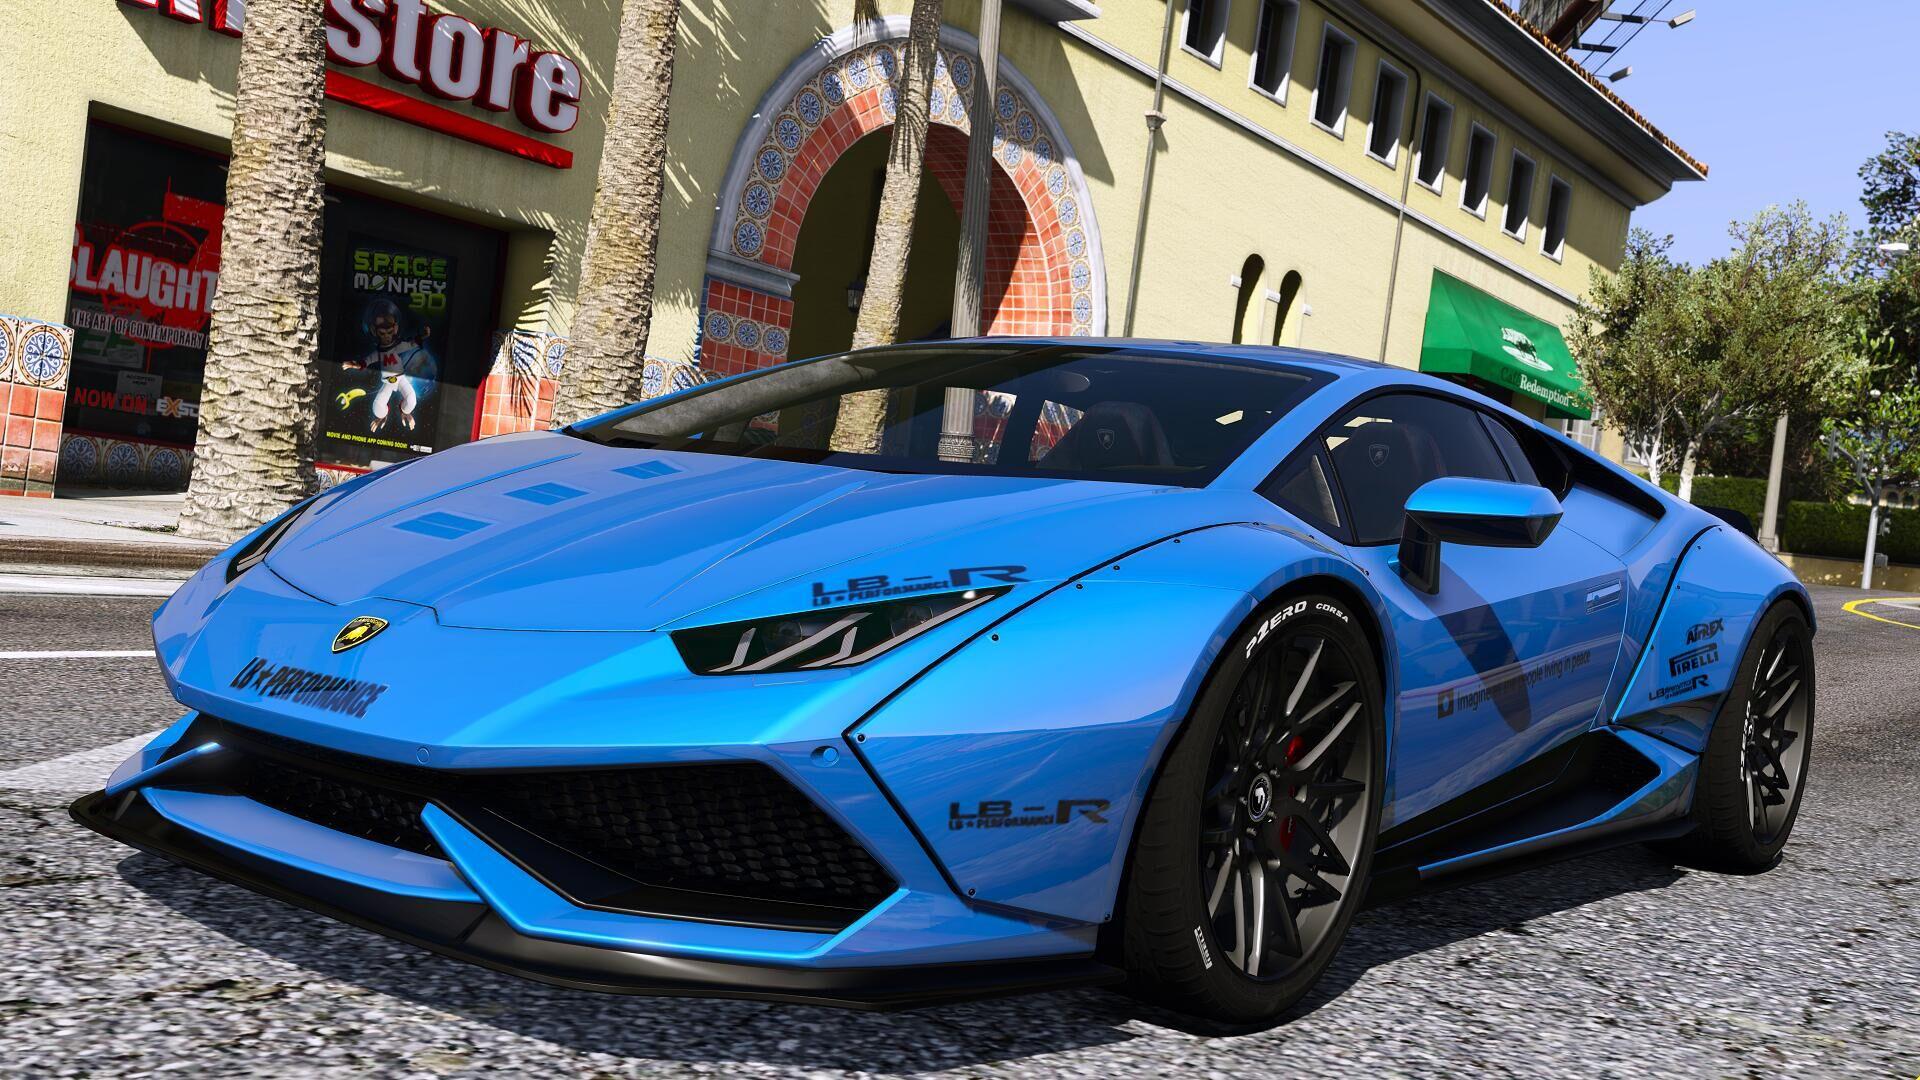 Lamborghini huracan LP610 [LibertyWalk  AddOn]  GTA5Mods.com